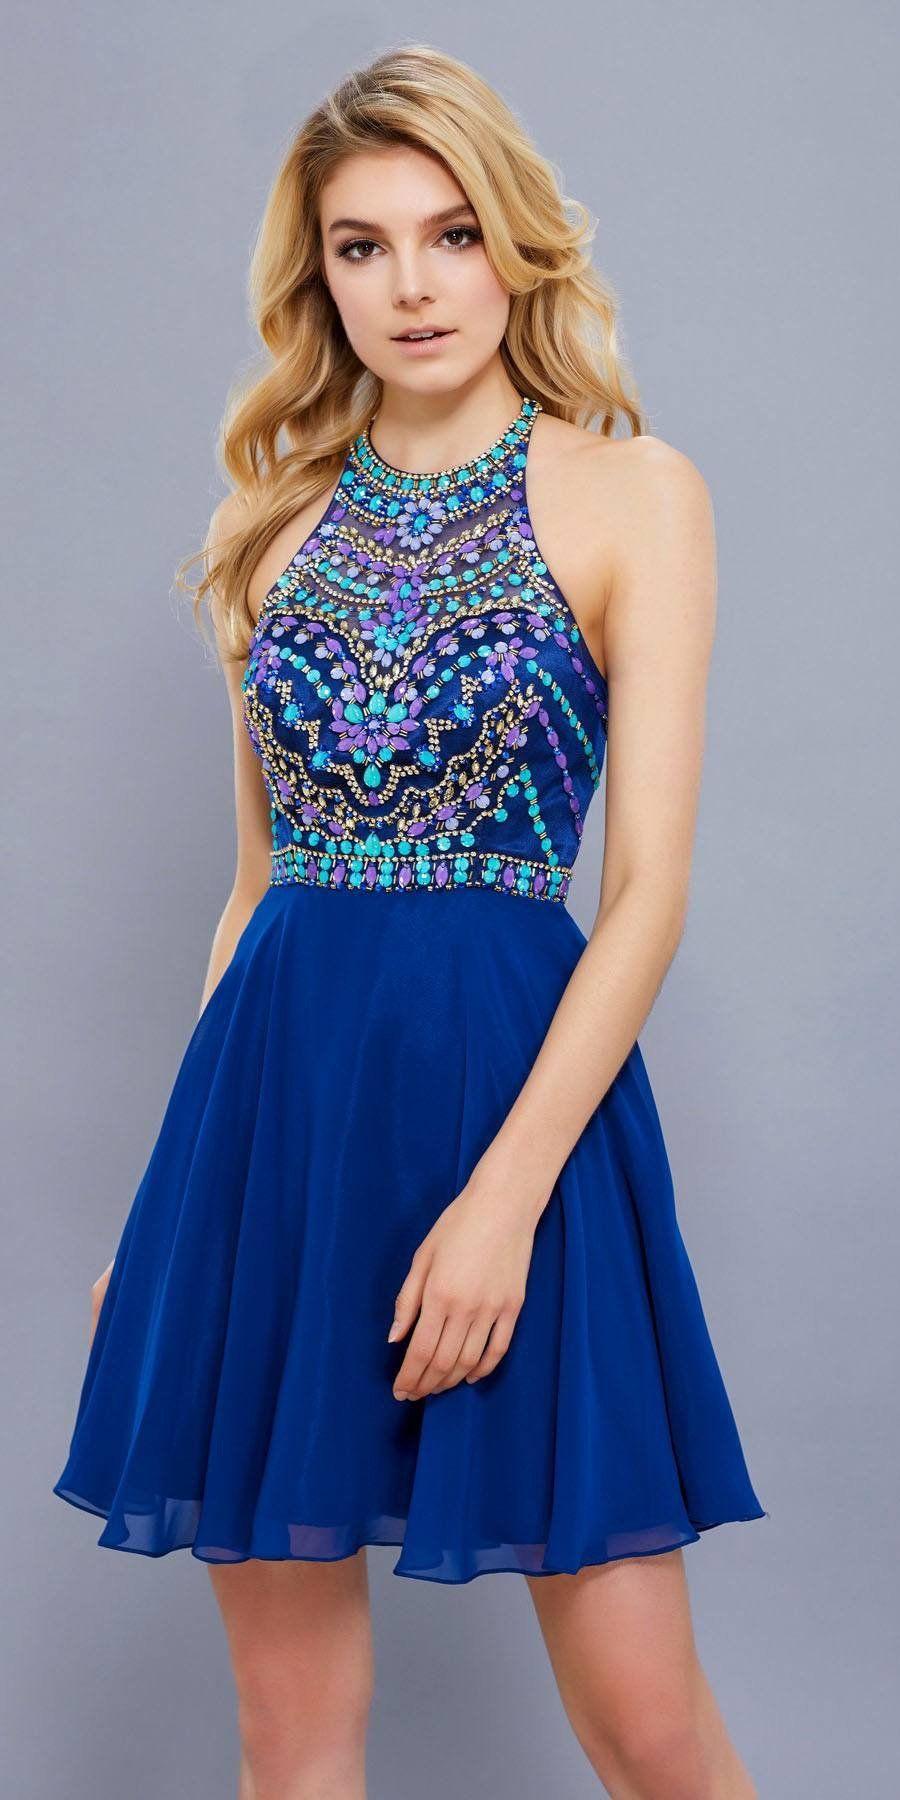 Beaded top round neckline halter short prom dress aqua